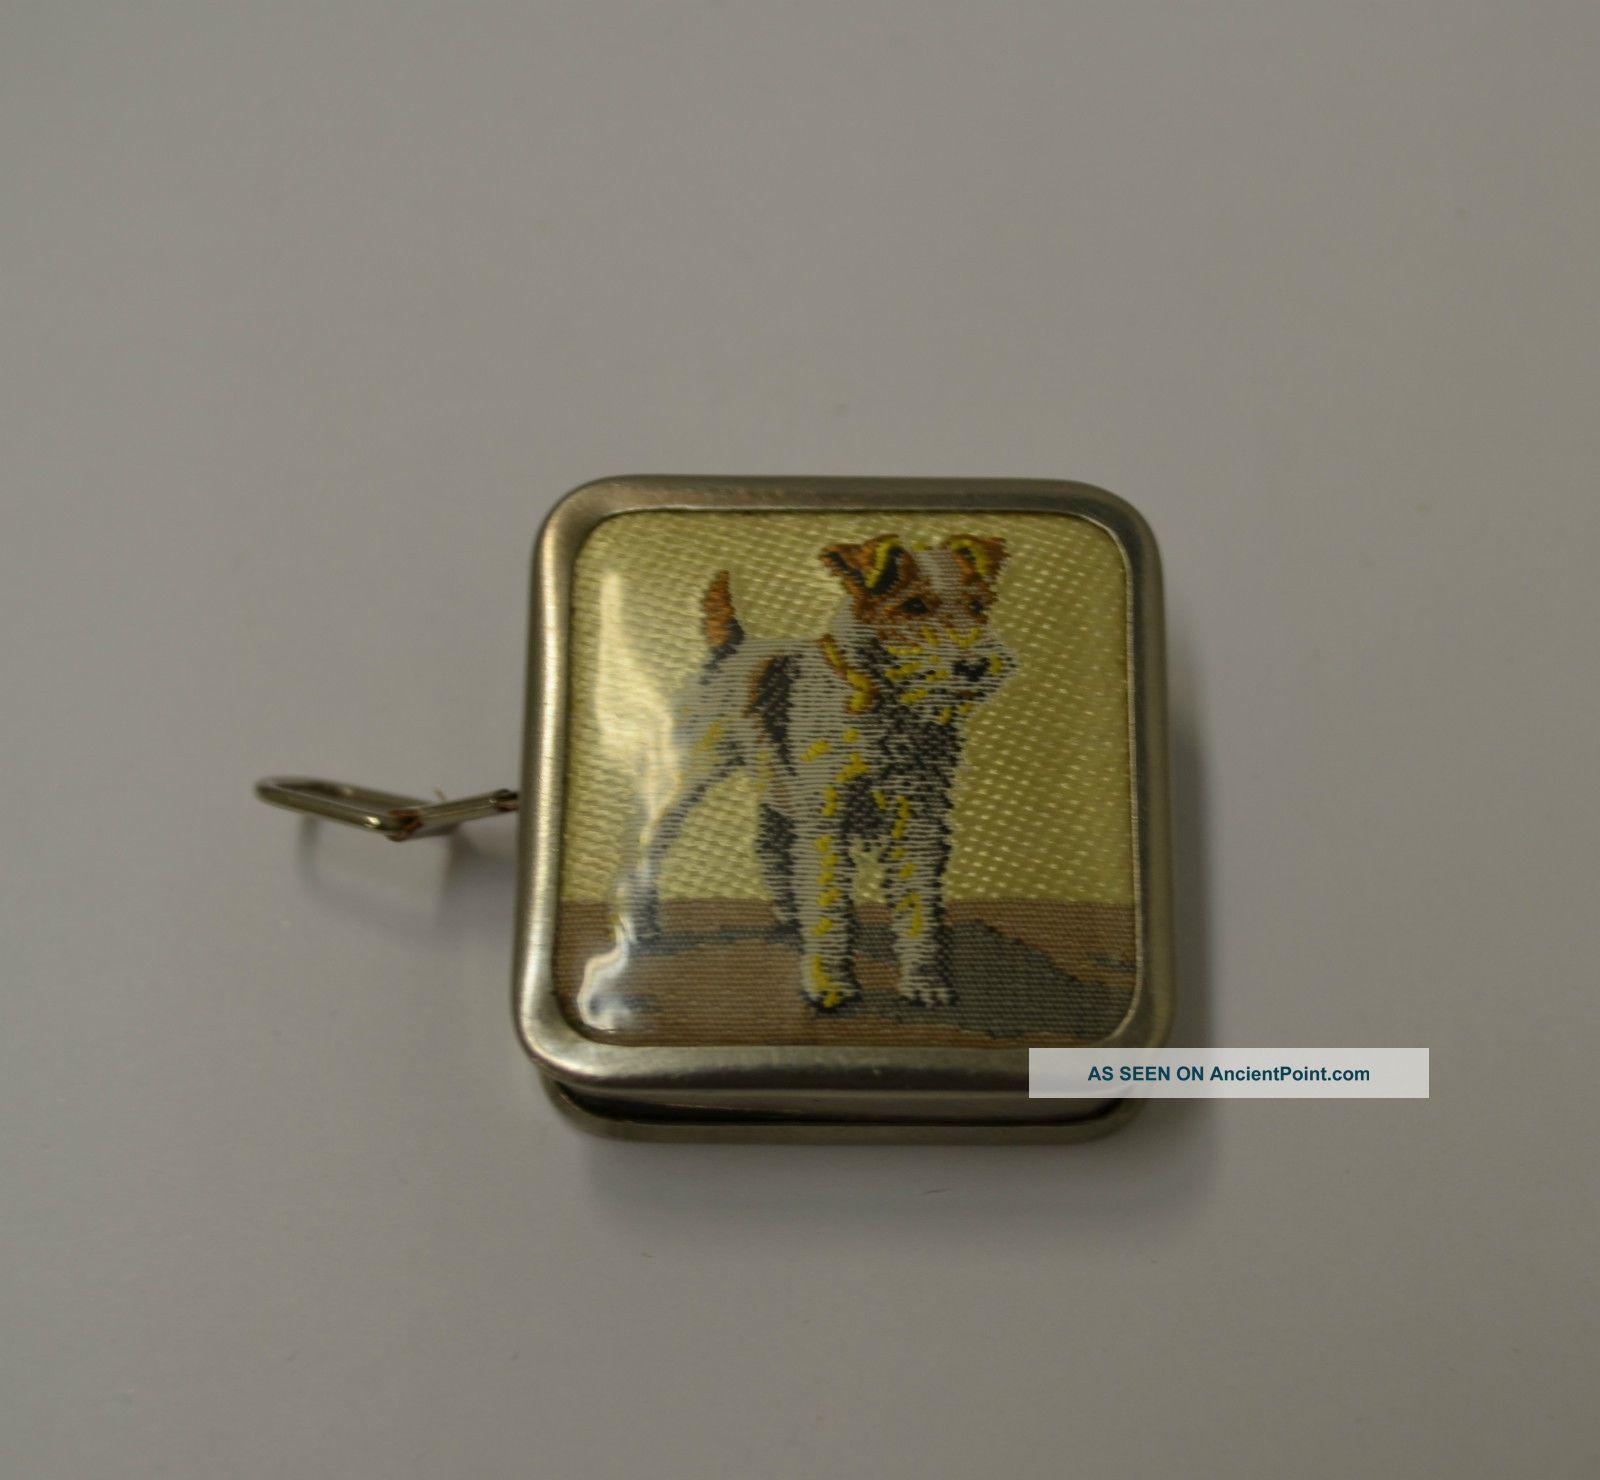 Vintage Sewing Tape Measure Scottie Dog Germany Tools, Scissors & Measures photo